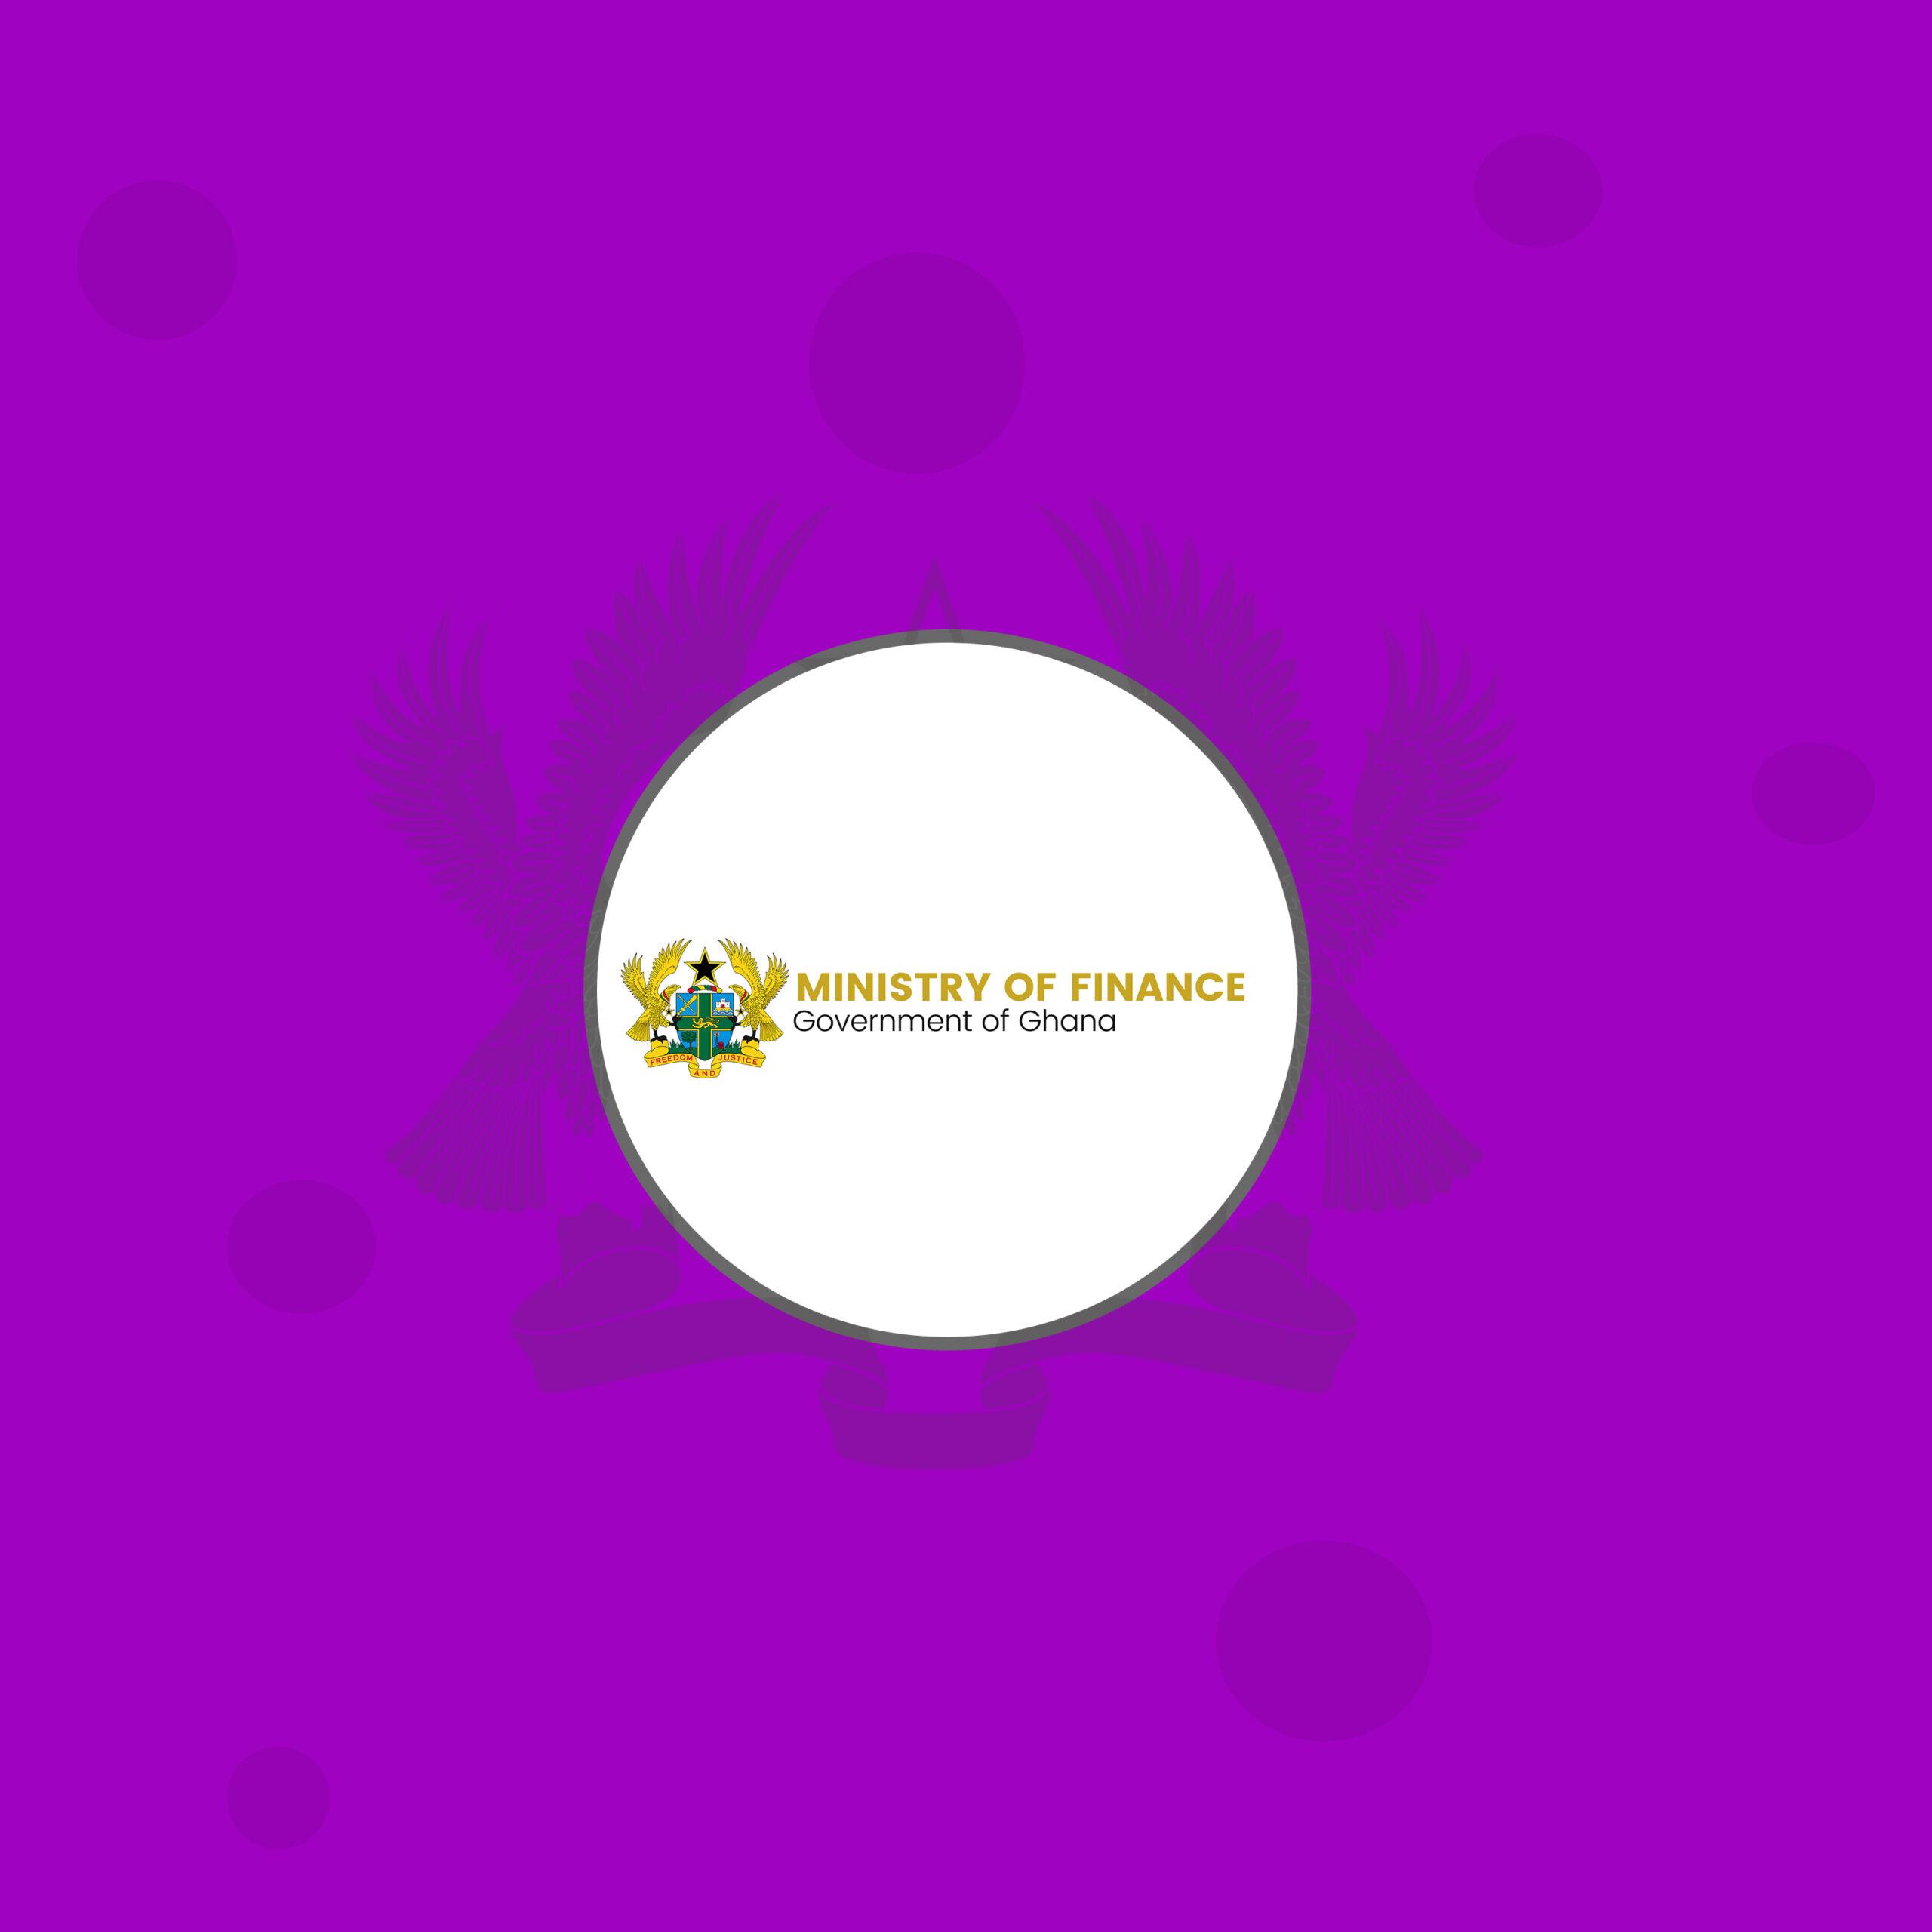 ministry of finanace